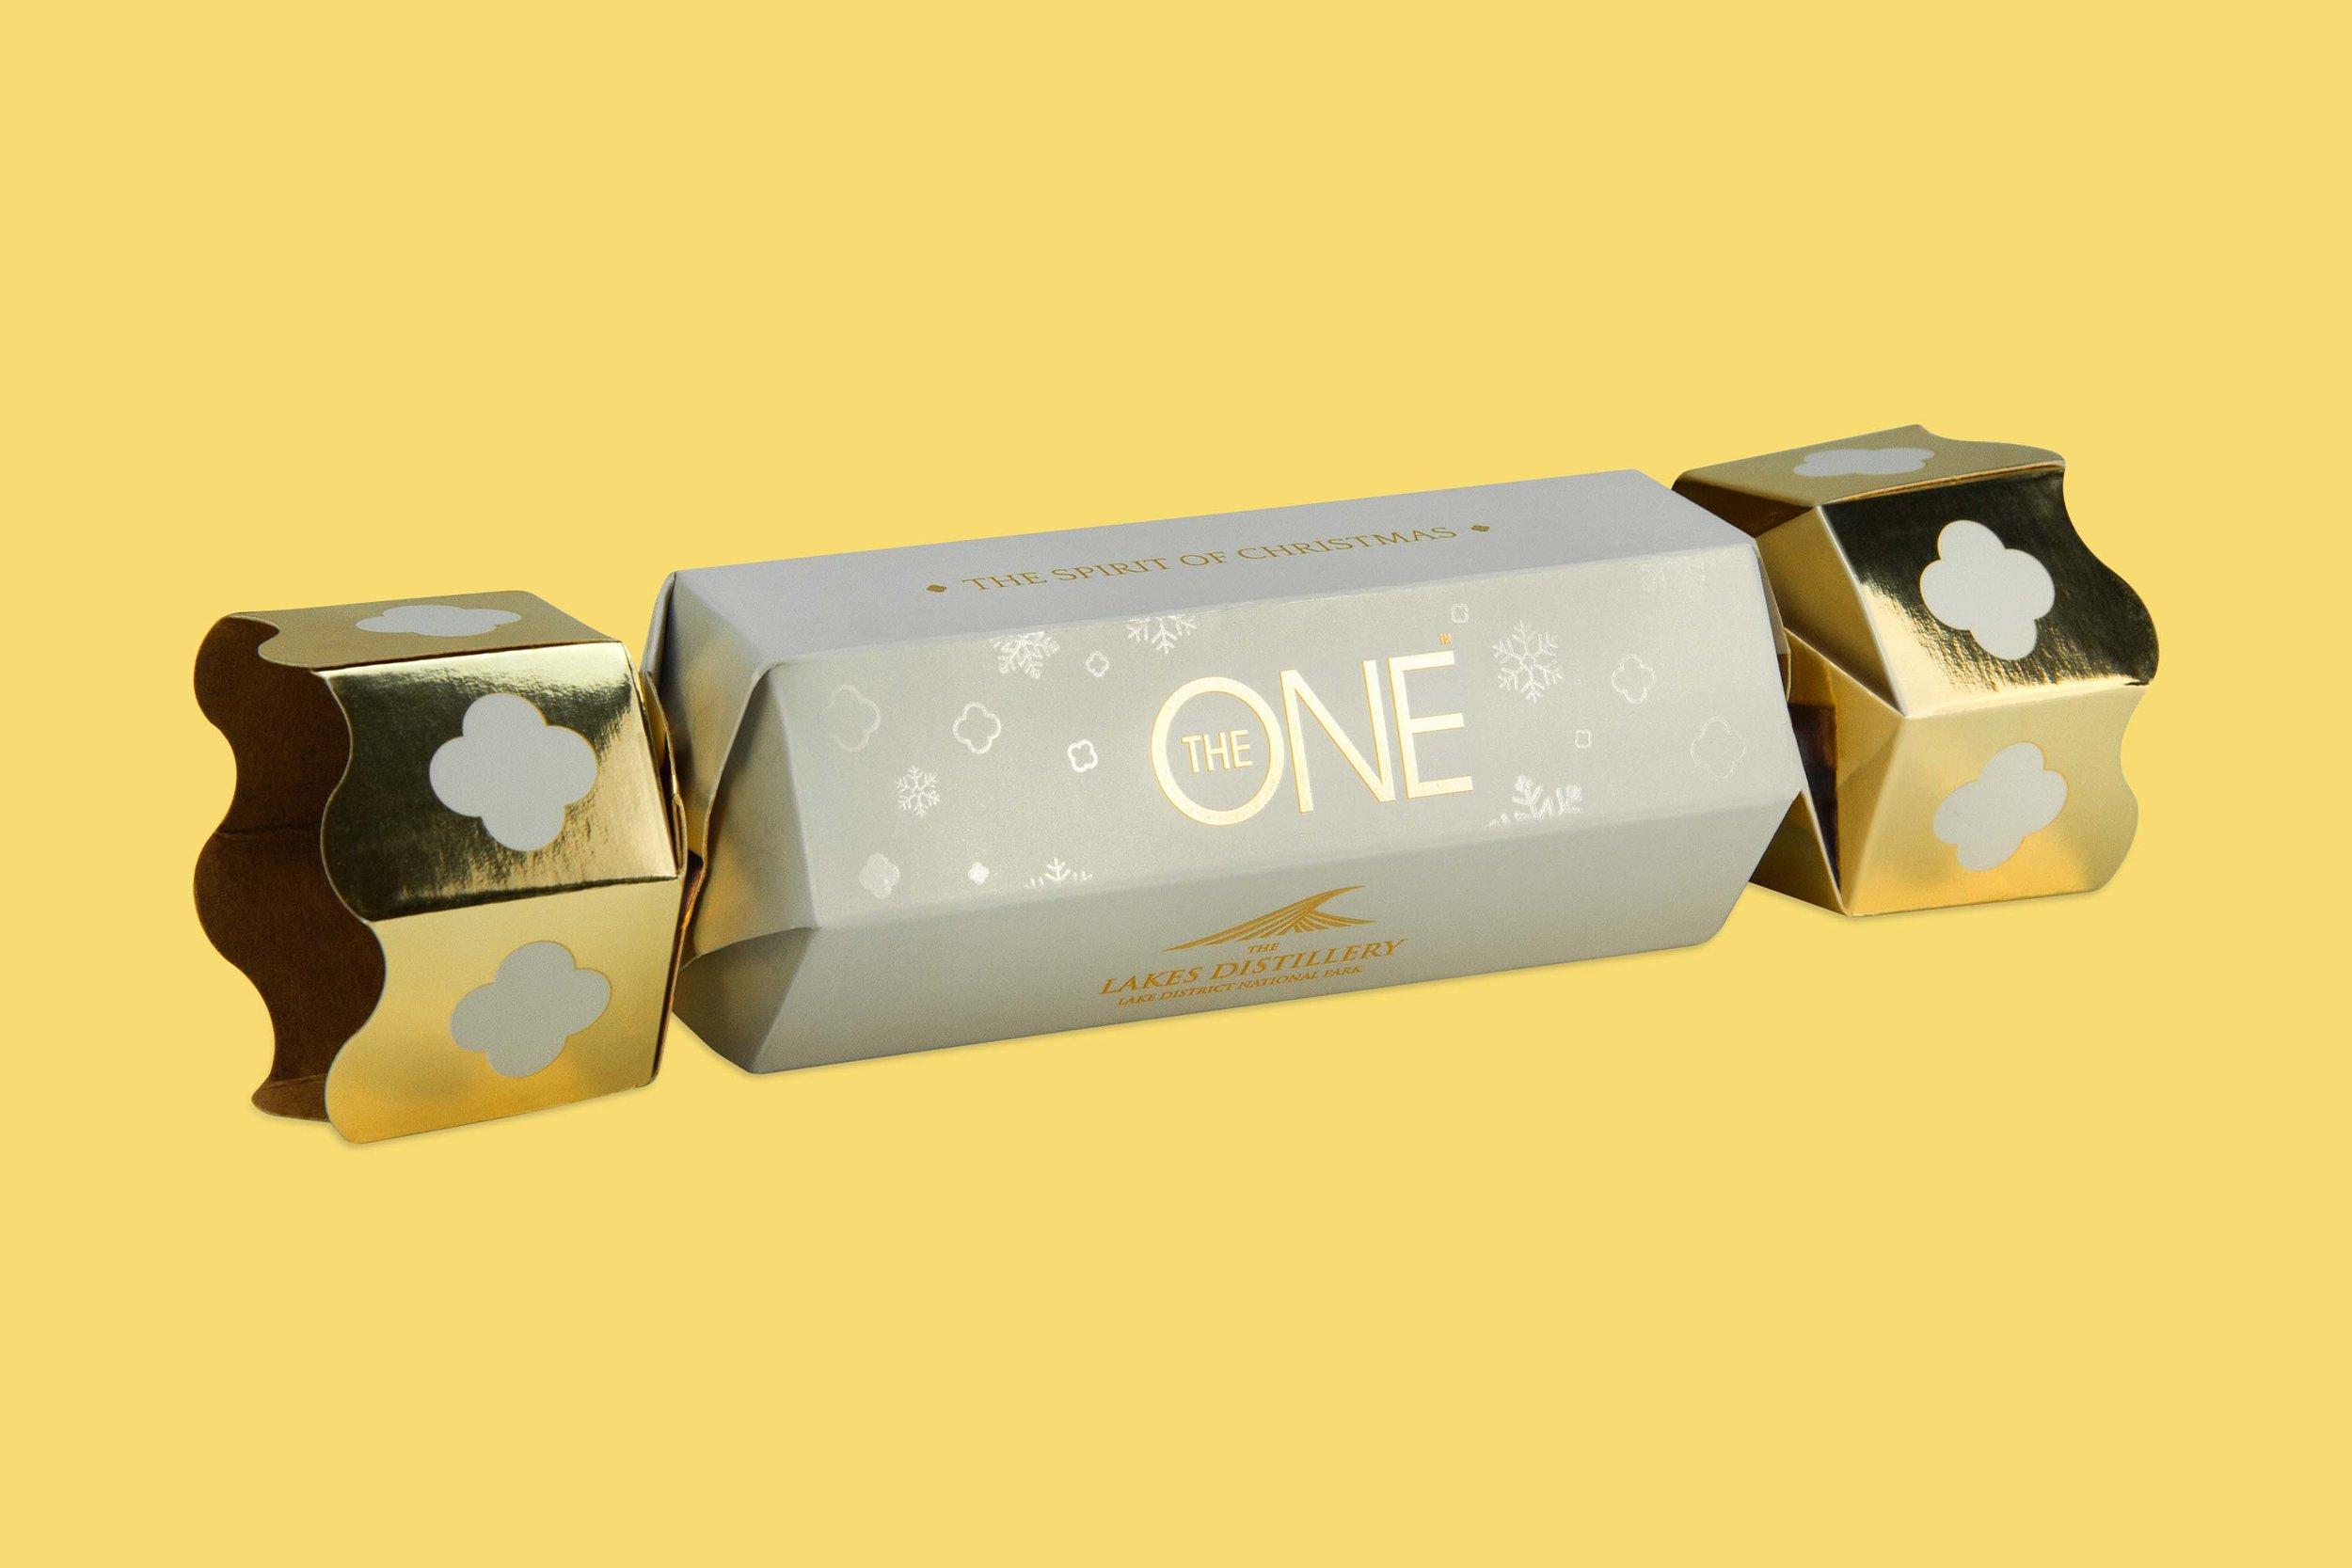 Lakes-Distillery-The-One-Vodka-Christmas-Cracker-Gift-Box-Packaging-Prototype-Design.jpg